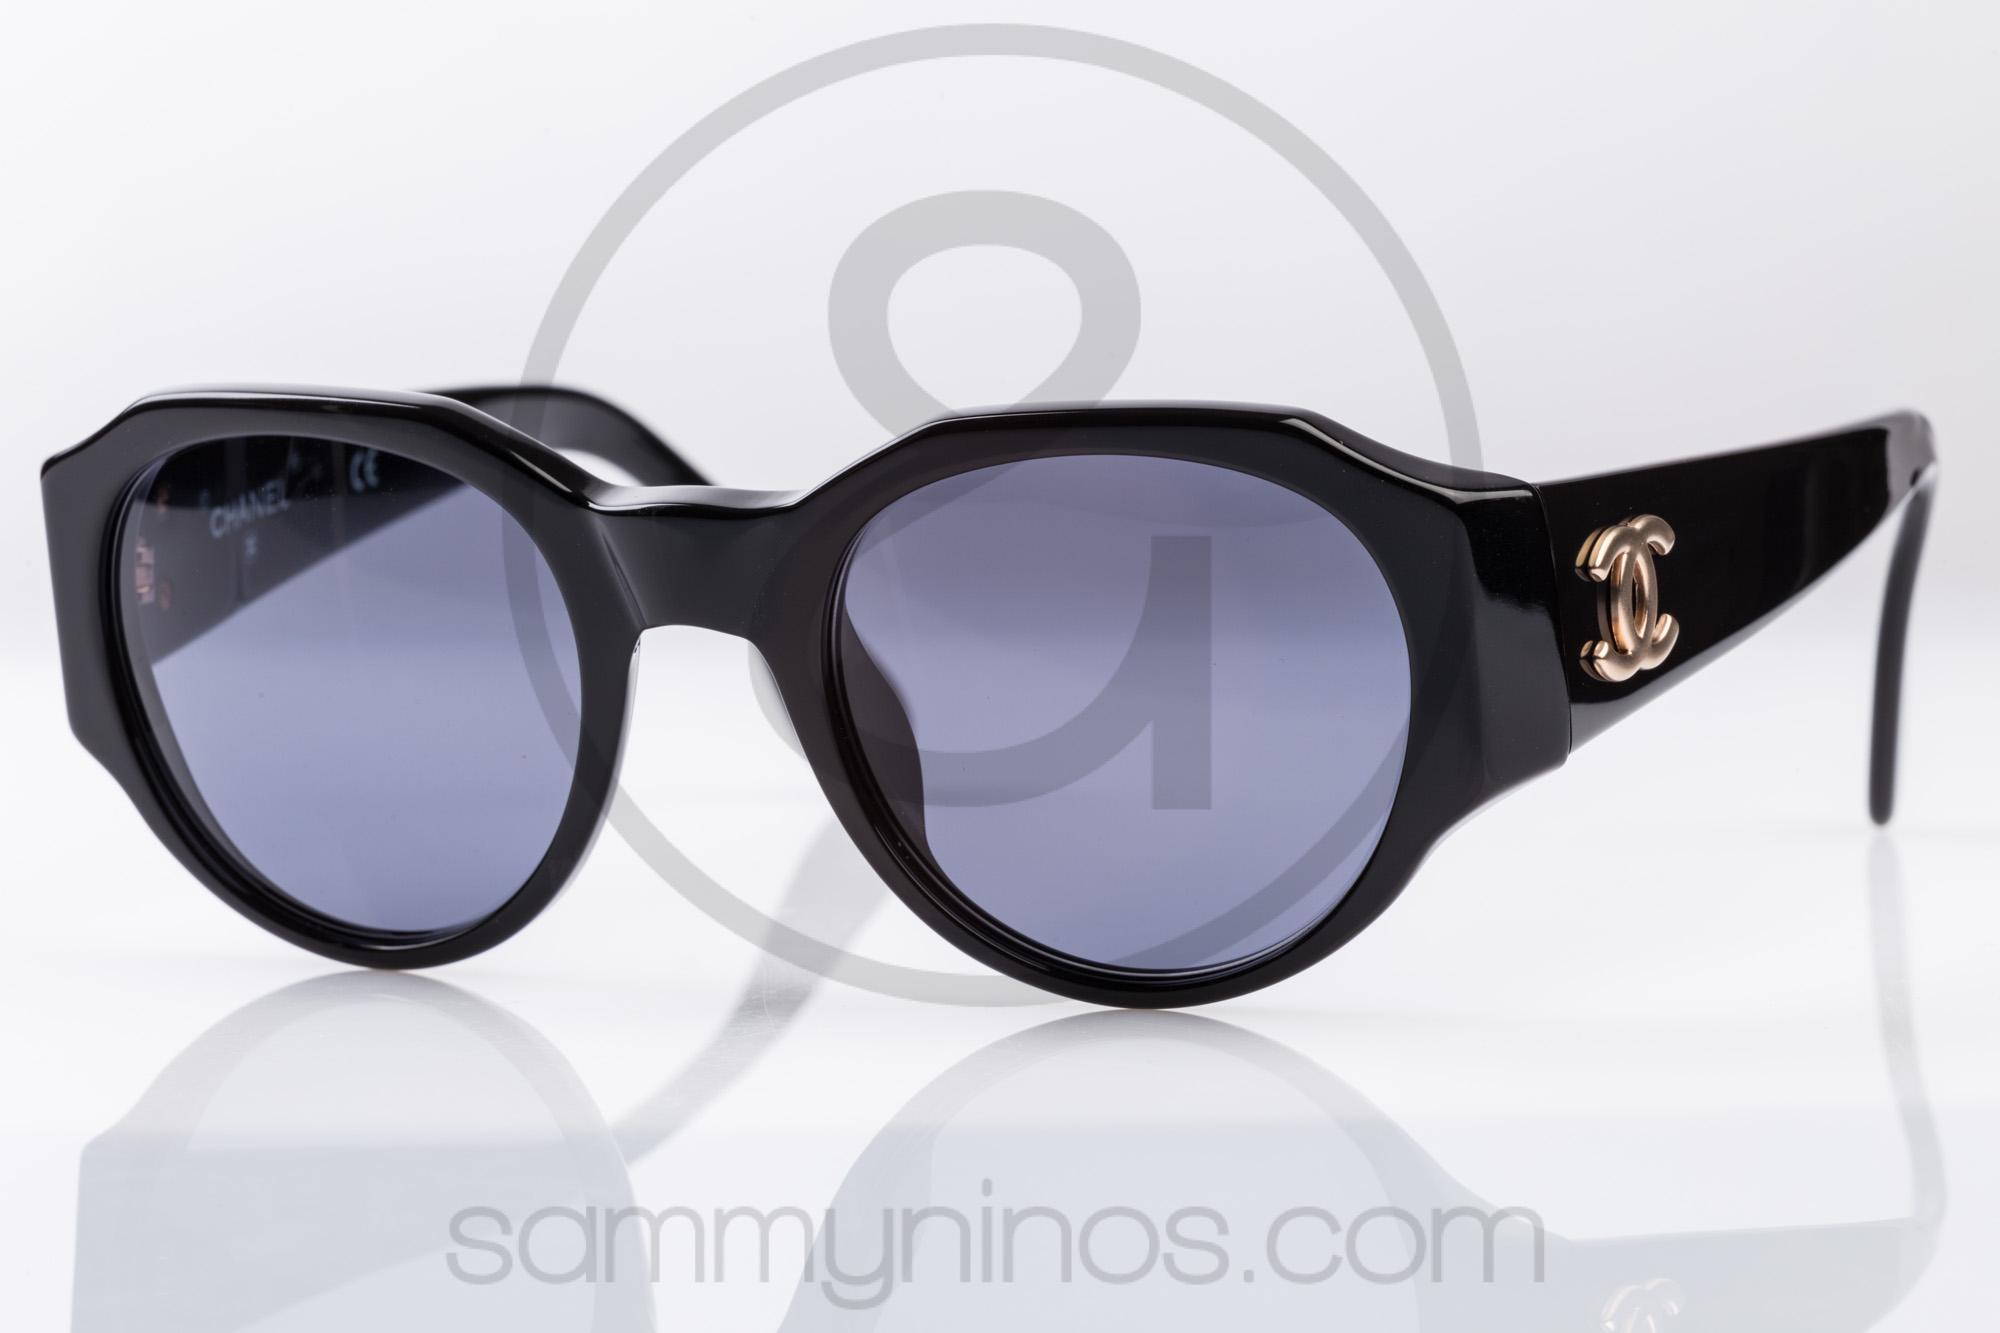 cdbe49be0002 Chanel Sunglasses On Sale Uk - Restaurant and Palinka Bar